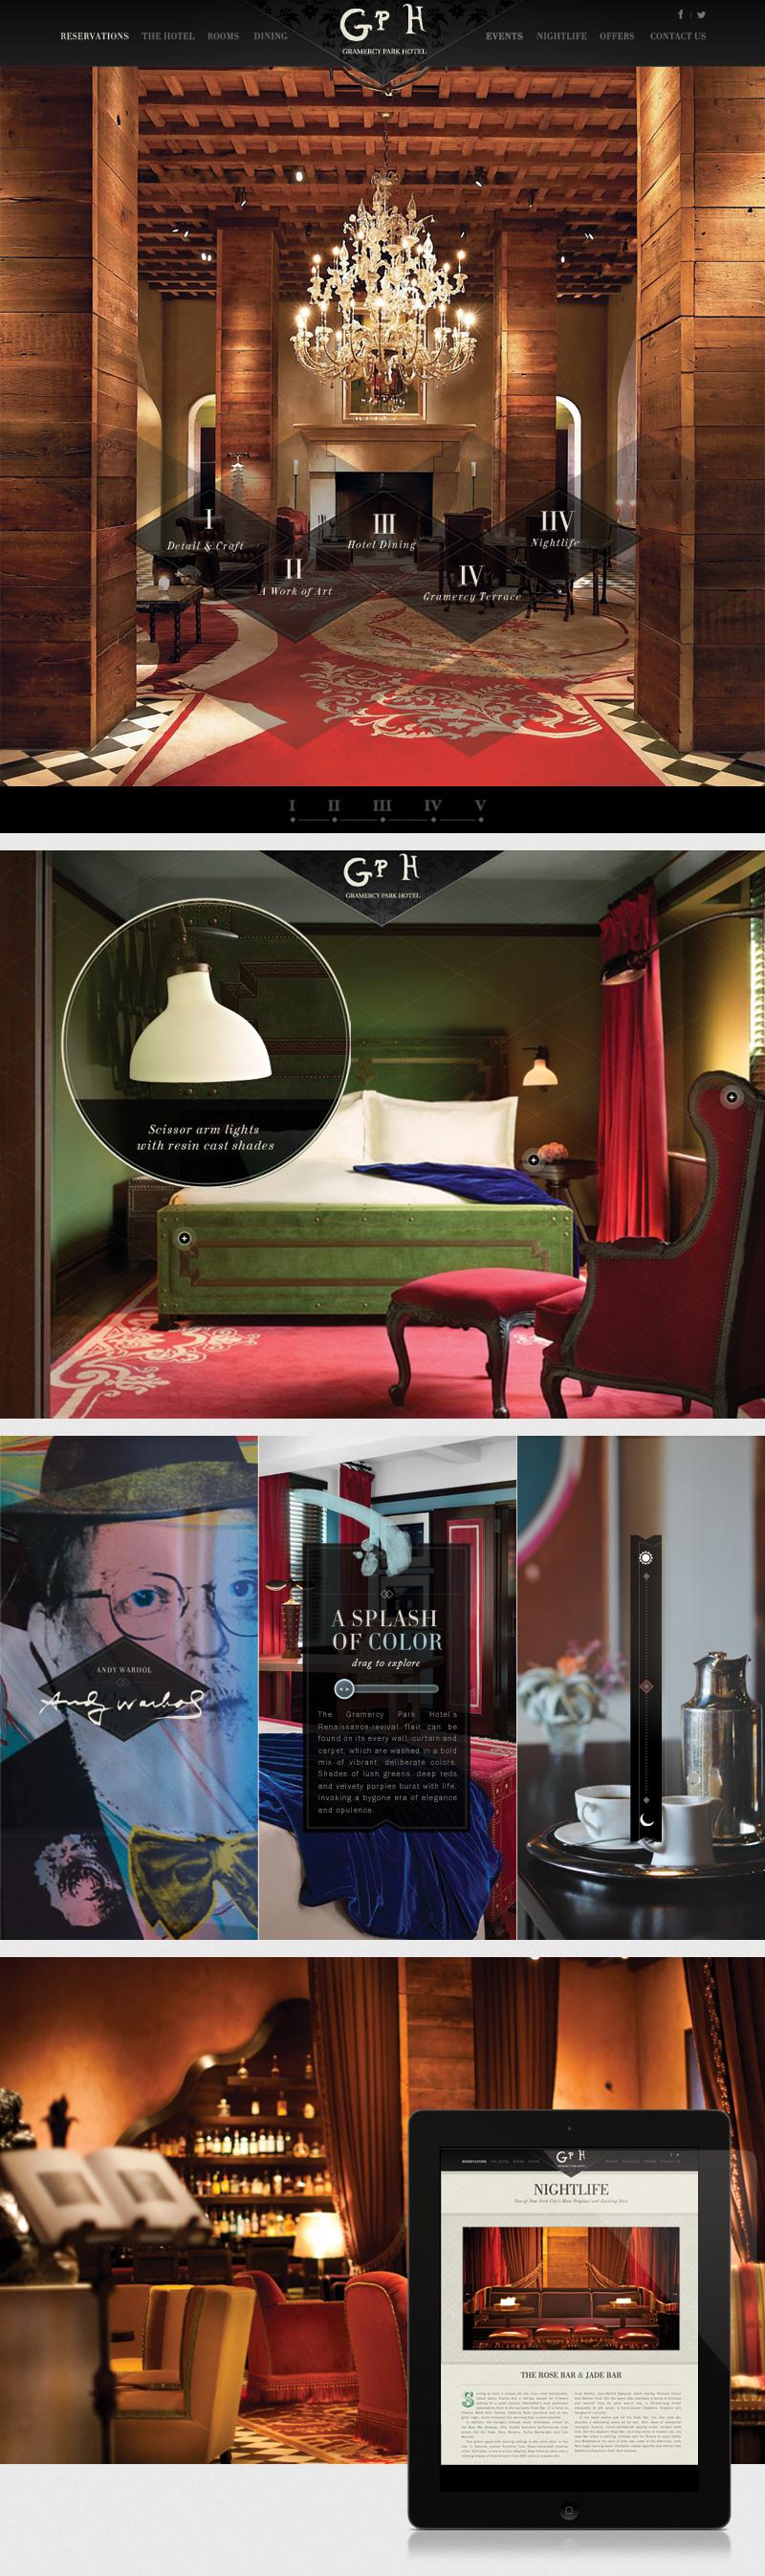 Gramercy Park Hotel by Canvas (via Creattica)